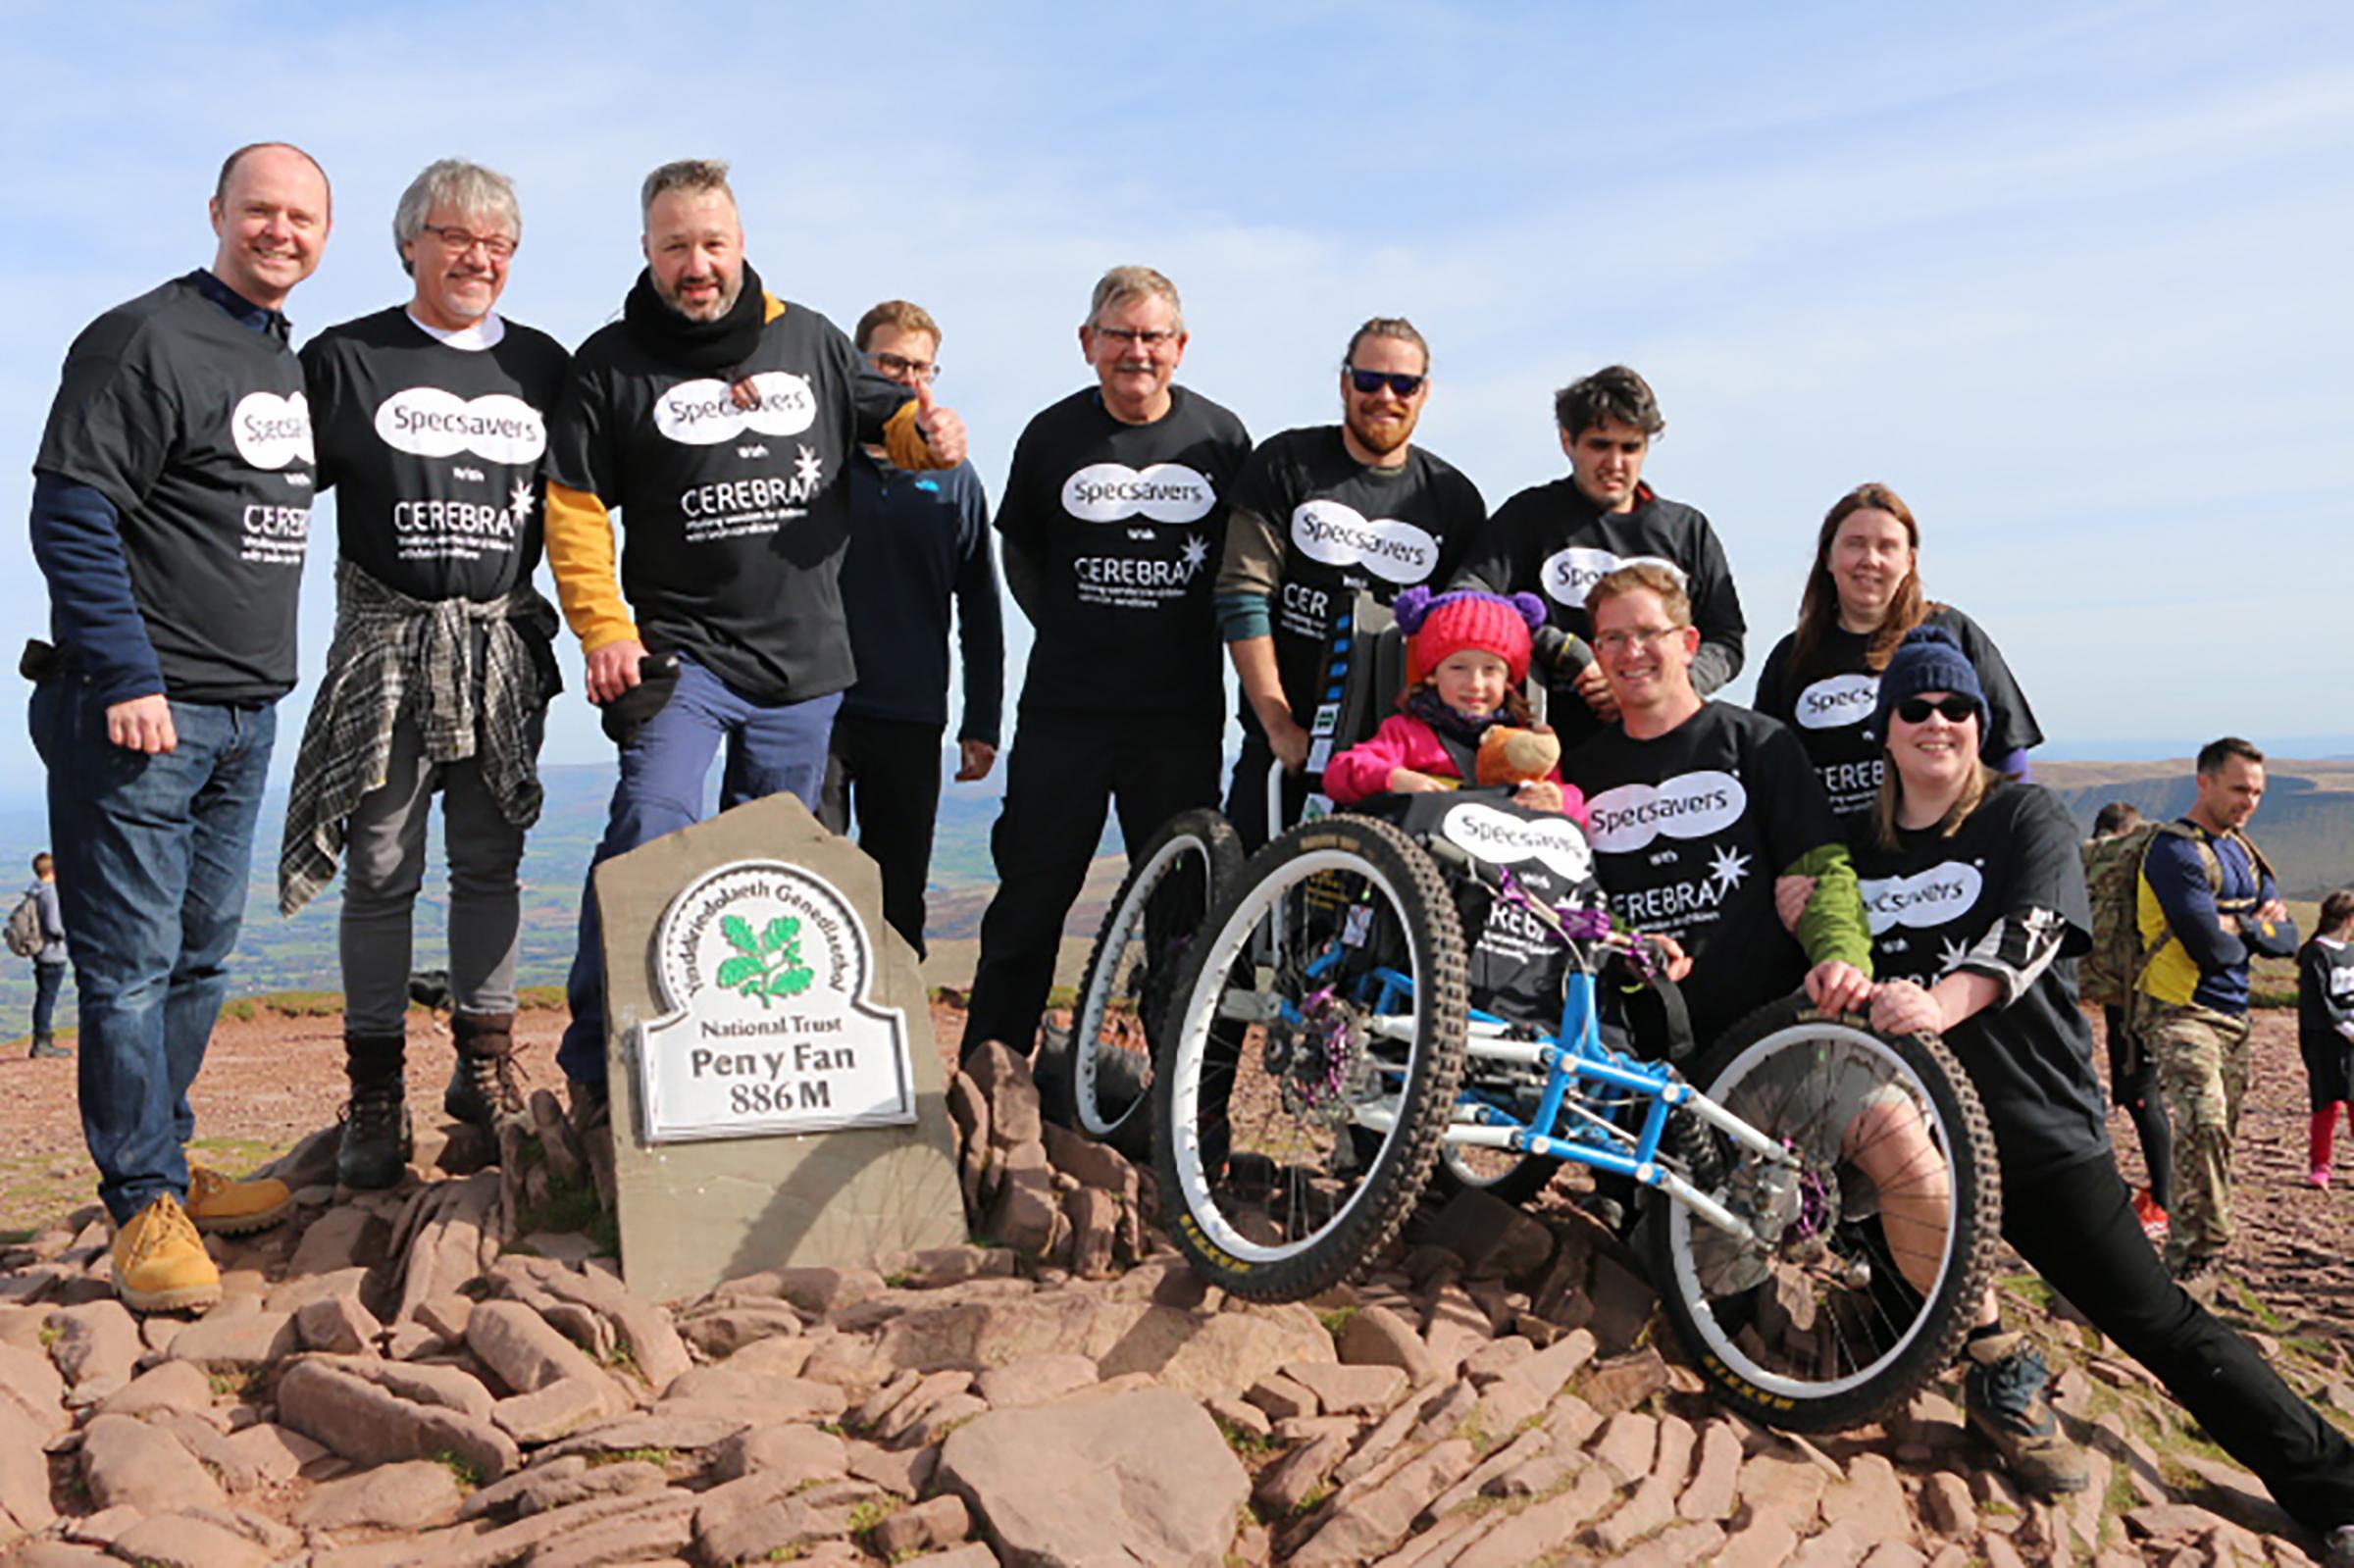 Specsavers Ammanford donates almost £20,000 to Cerebra